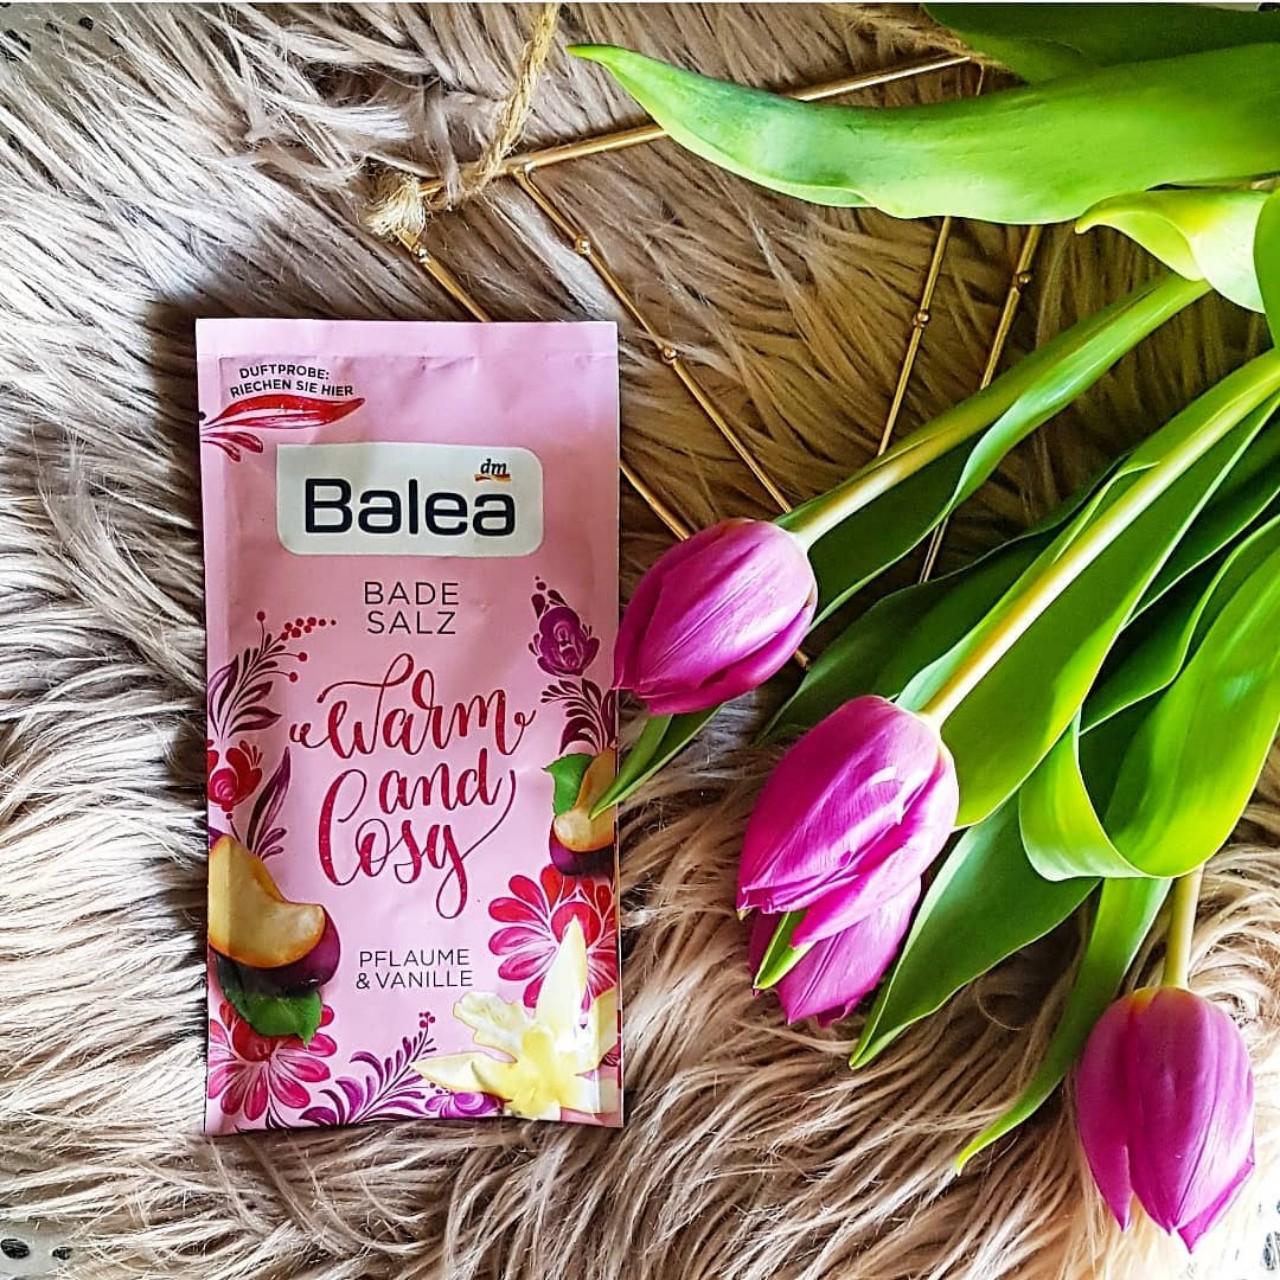 Muối tắm Balea hương hoa mận